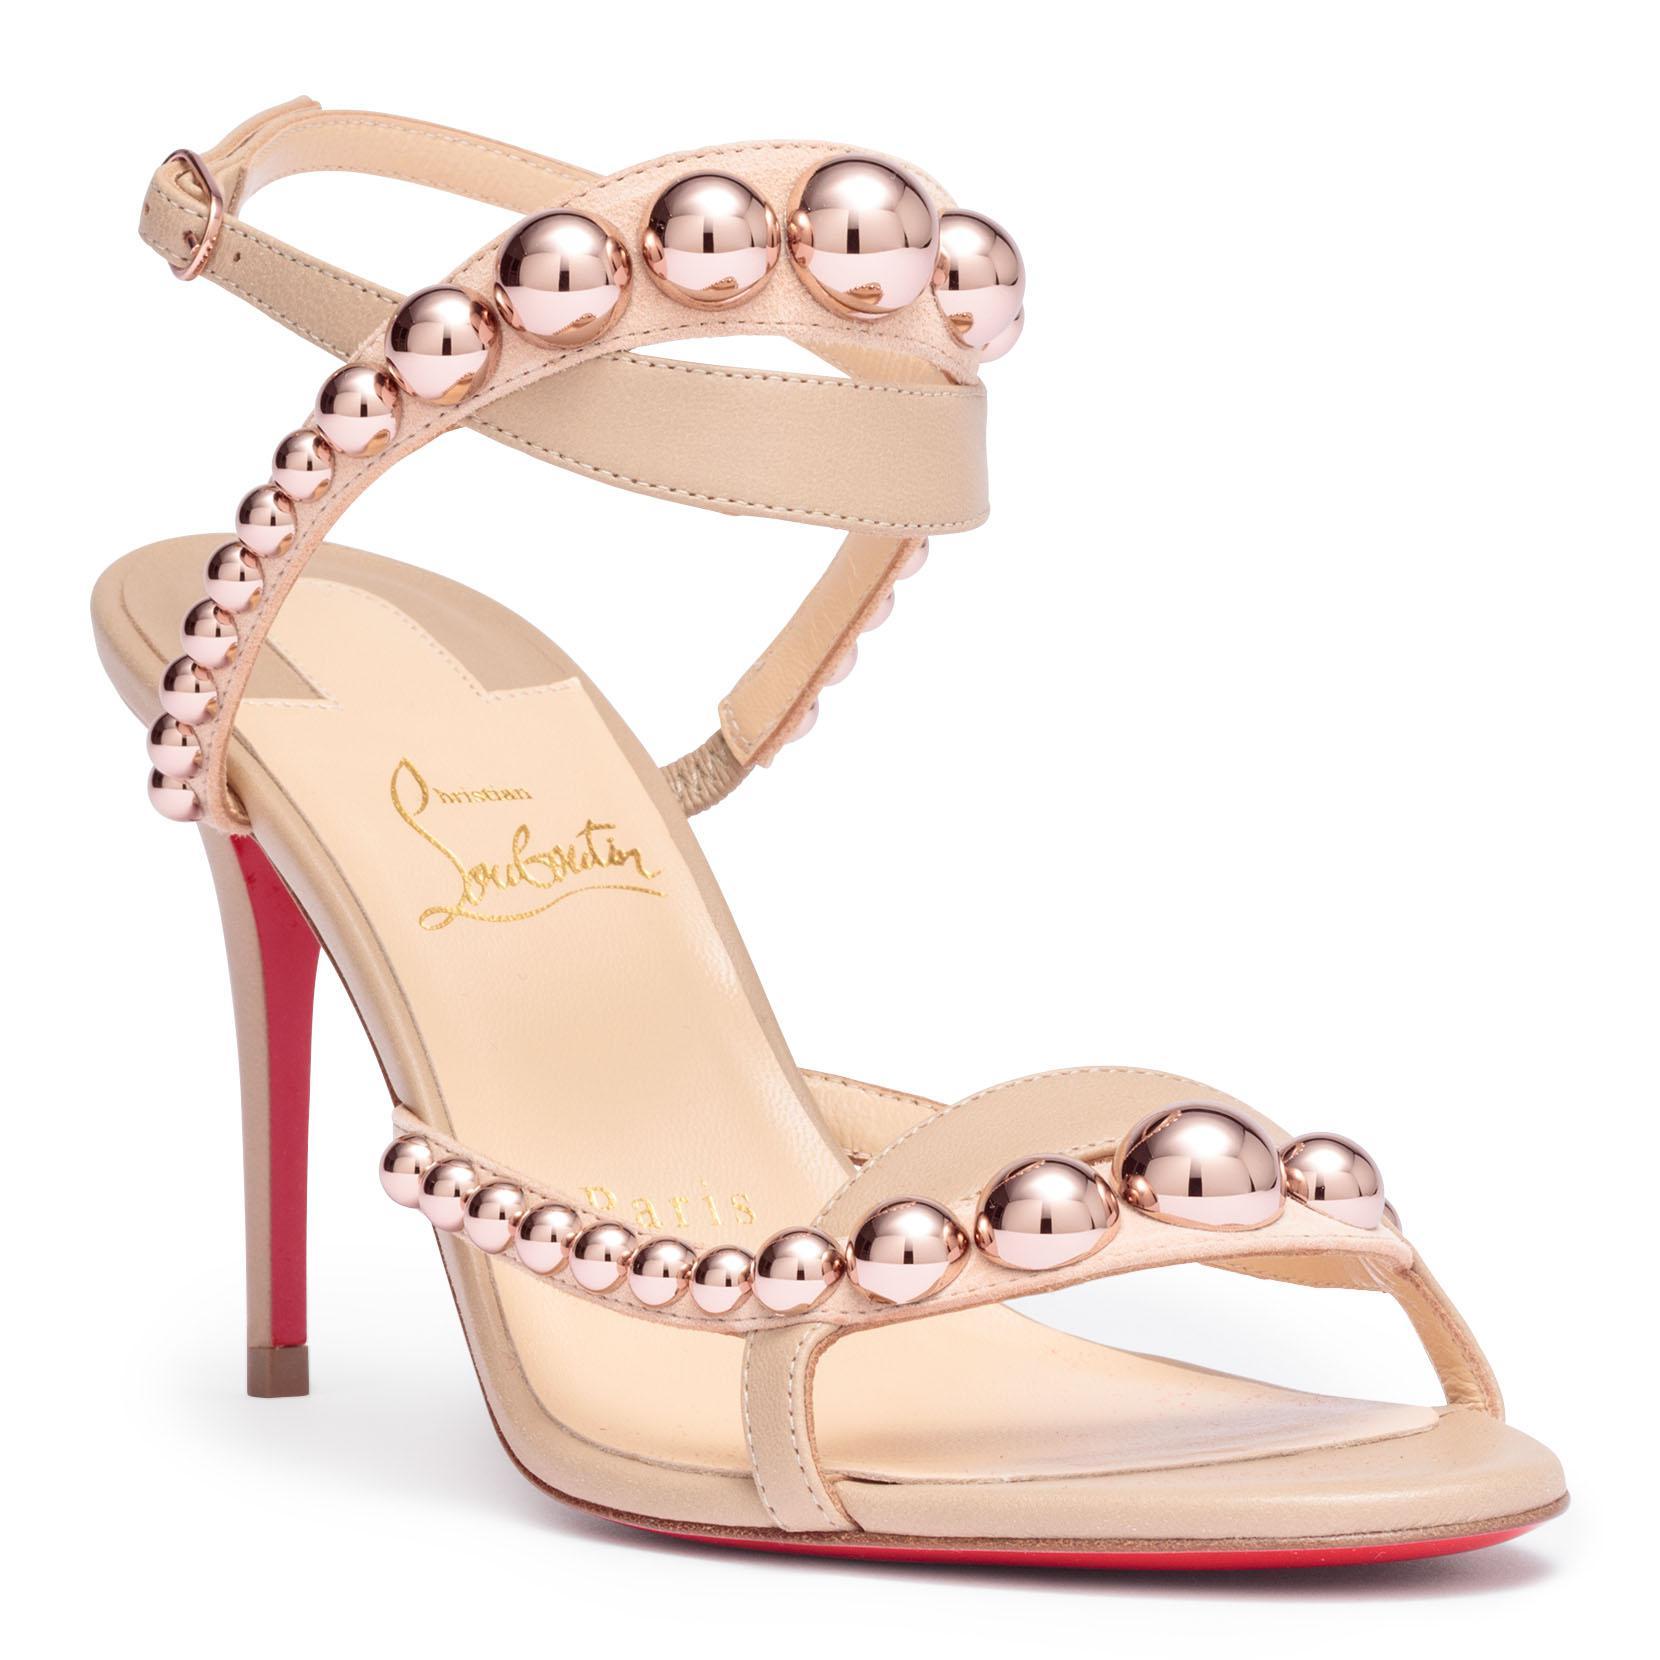 Galeria 85 nappa beige sandals Christian Louboutin ifn30gl8q